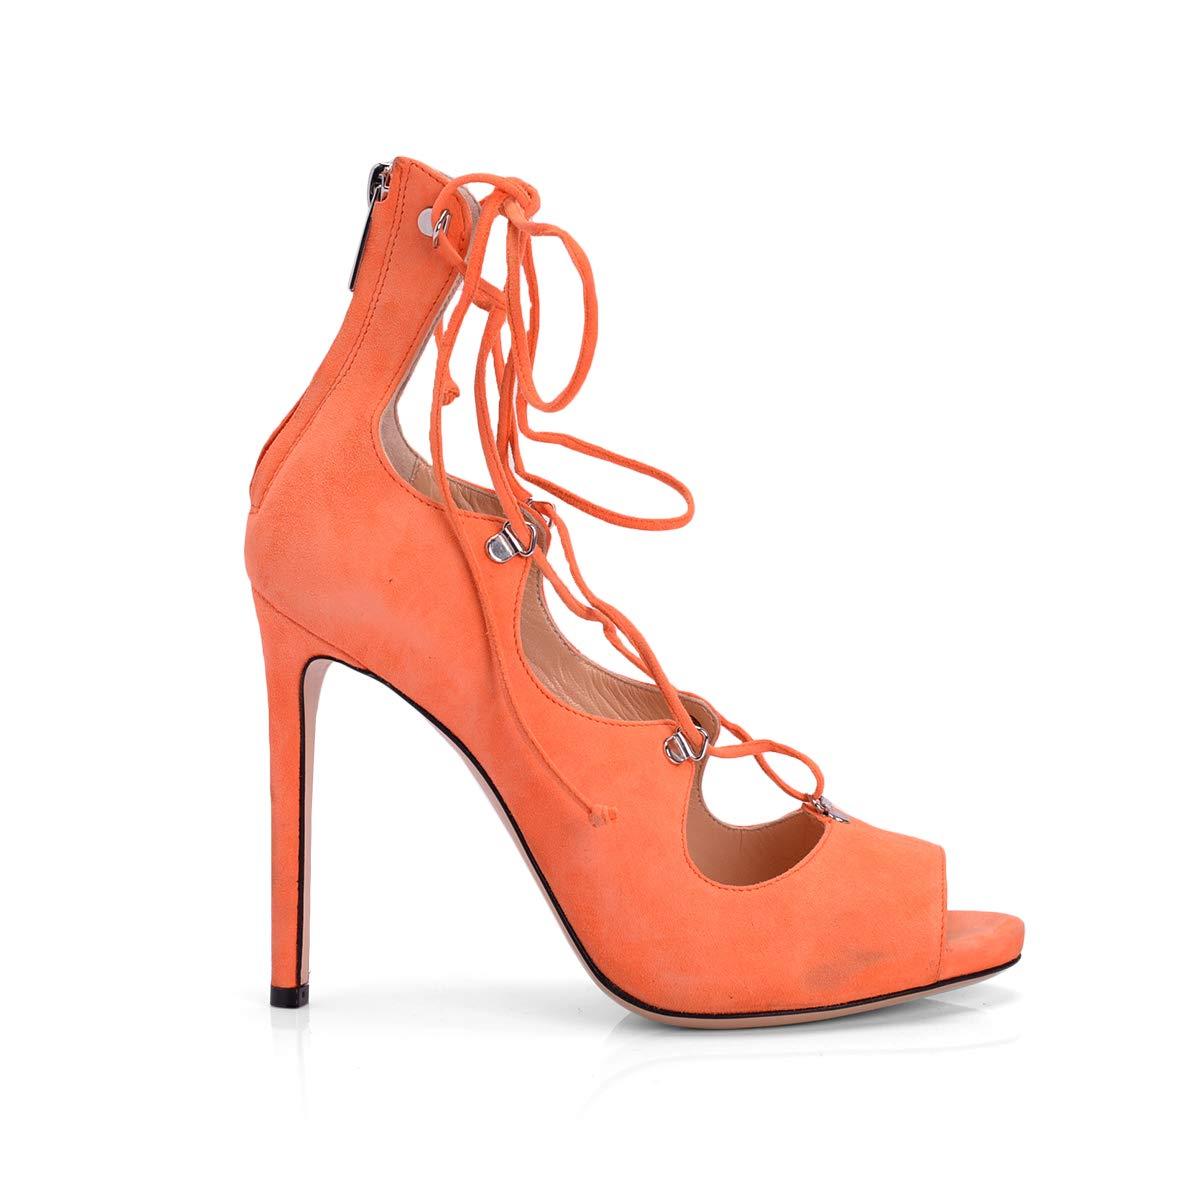 RosaO Sandalen Nichel - 1P20RP.Y2CQ   Nichel Sandalo Sandalo Sandalo - Größe  36(EU) 36a68d